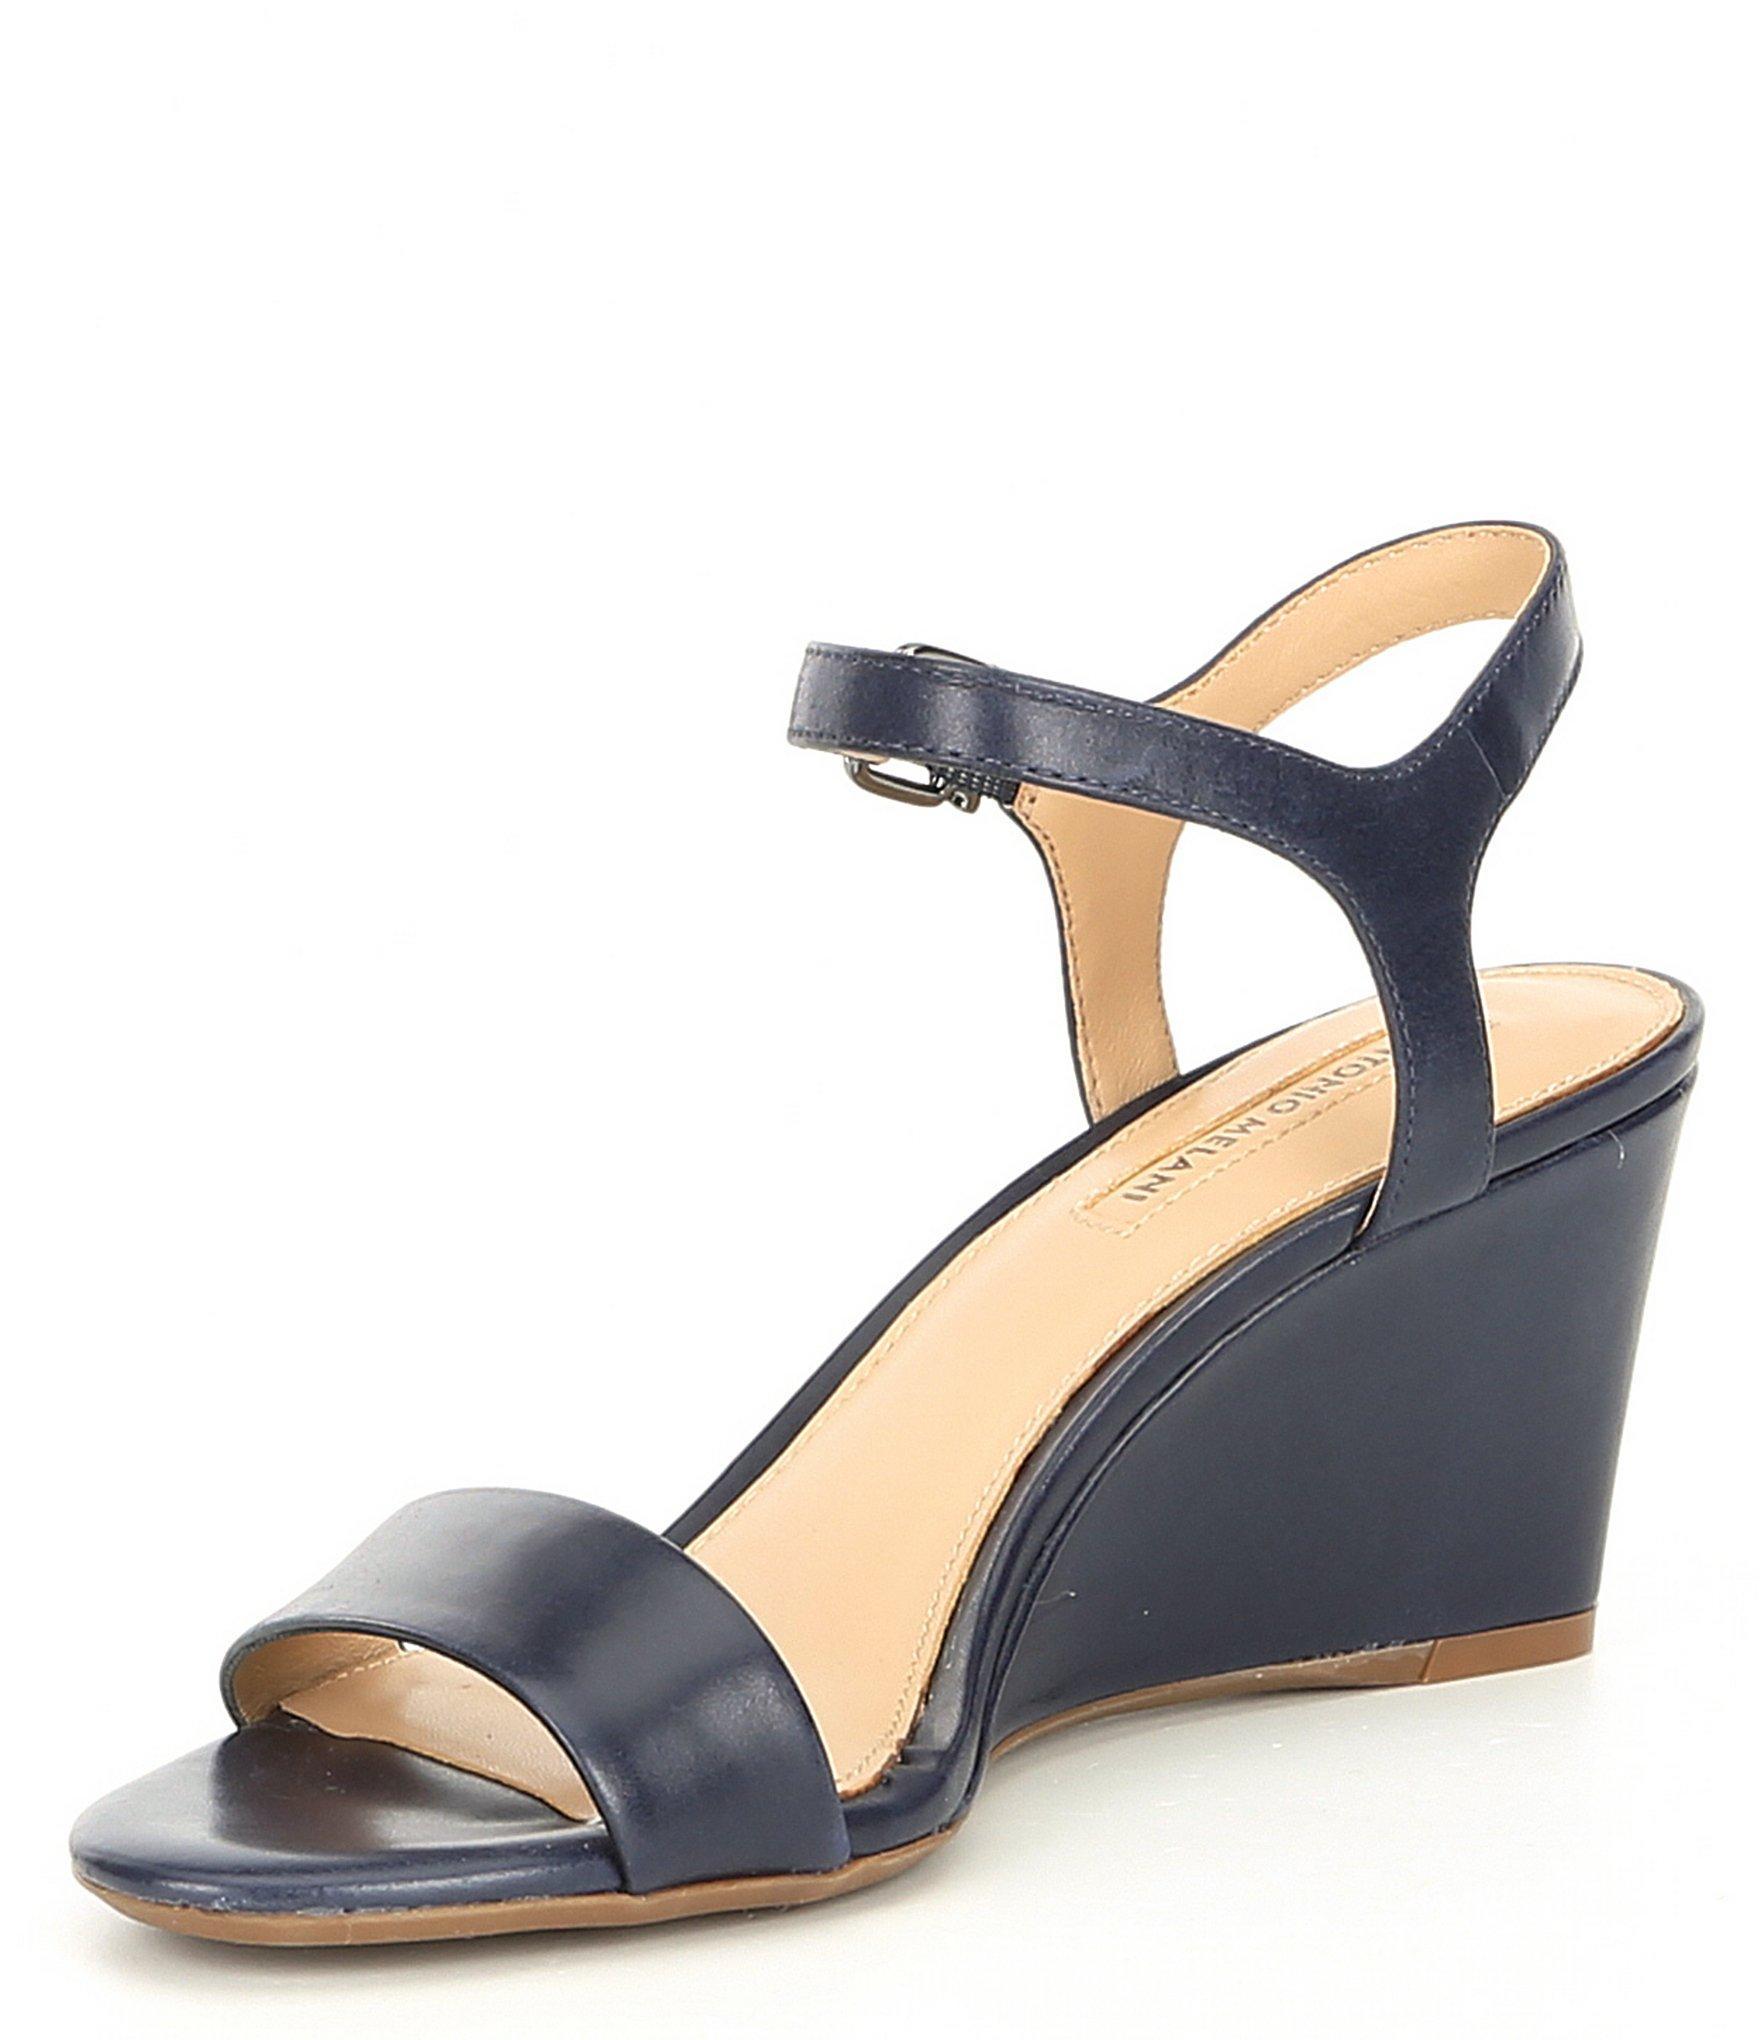 3410220e00e4 Antonio Melani - Blue Floraina Leather Ankle Strap Wedges - Lyst. View  fullscreen